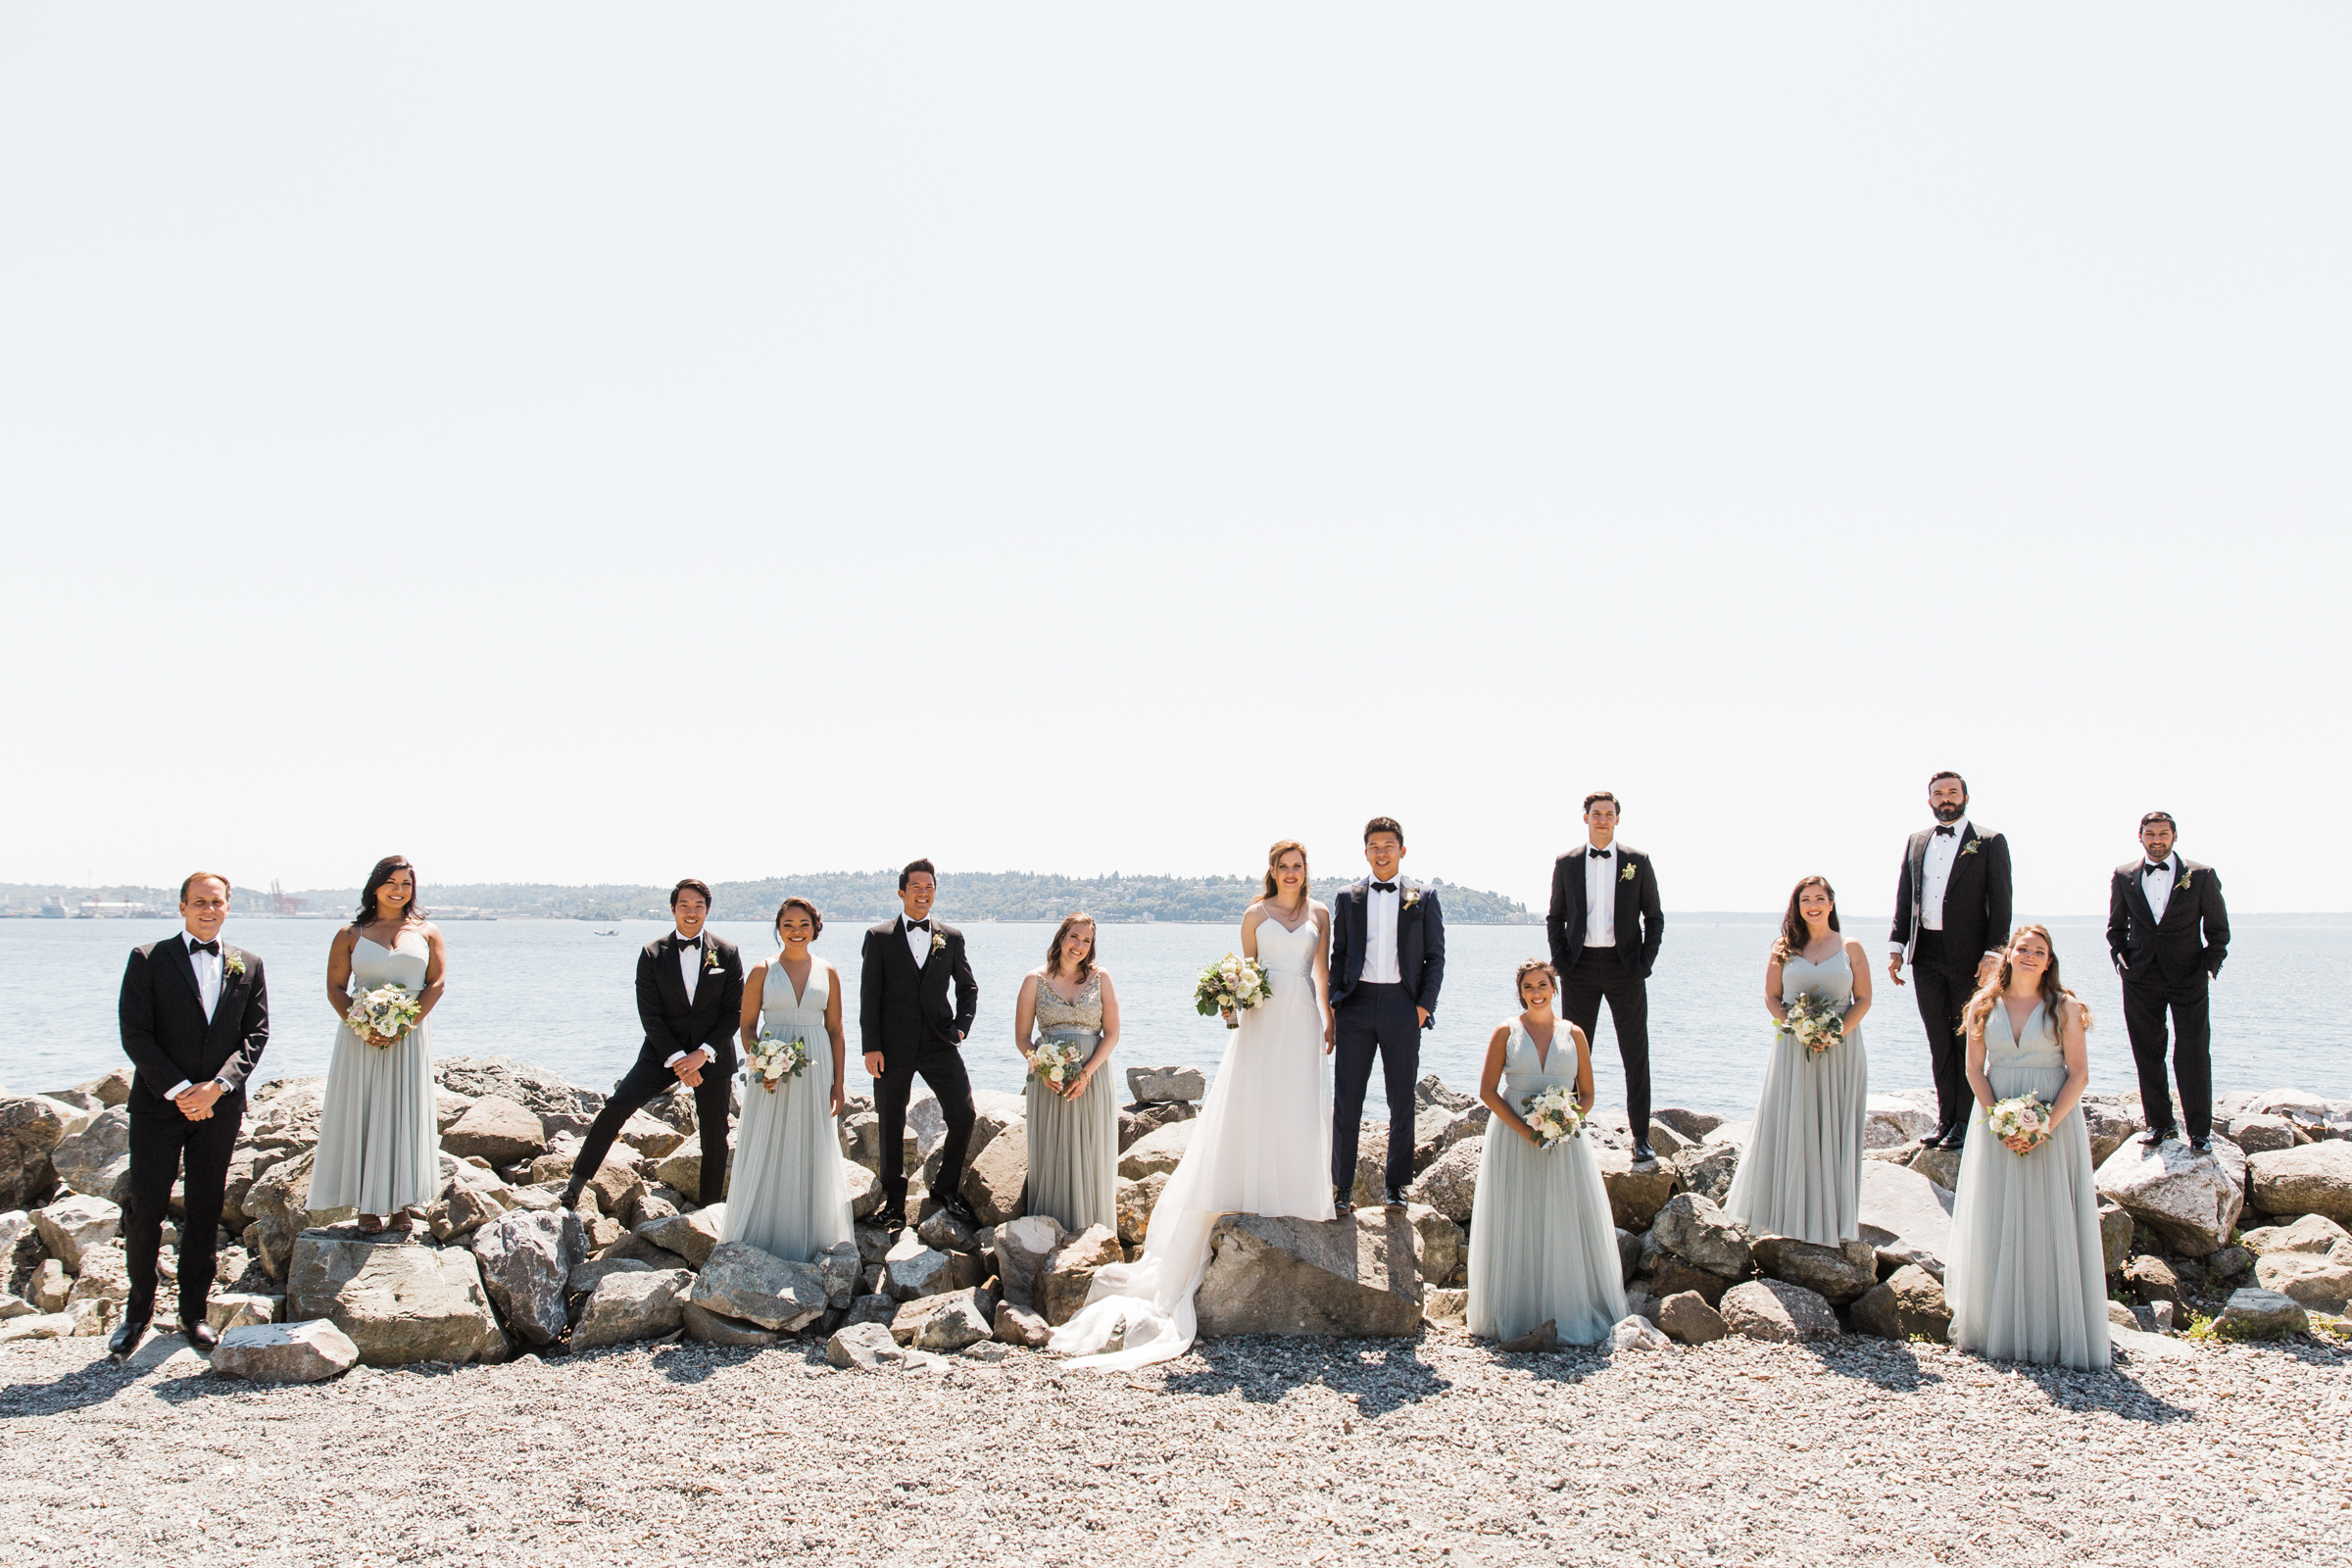 bridal-party-portrait-on-west-seattle-beach-stephanie-cristalli-photography